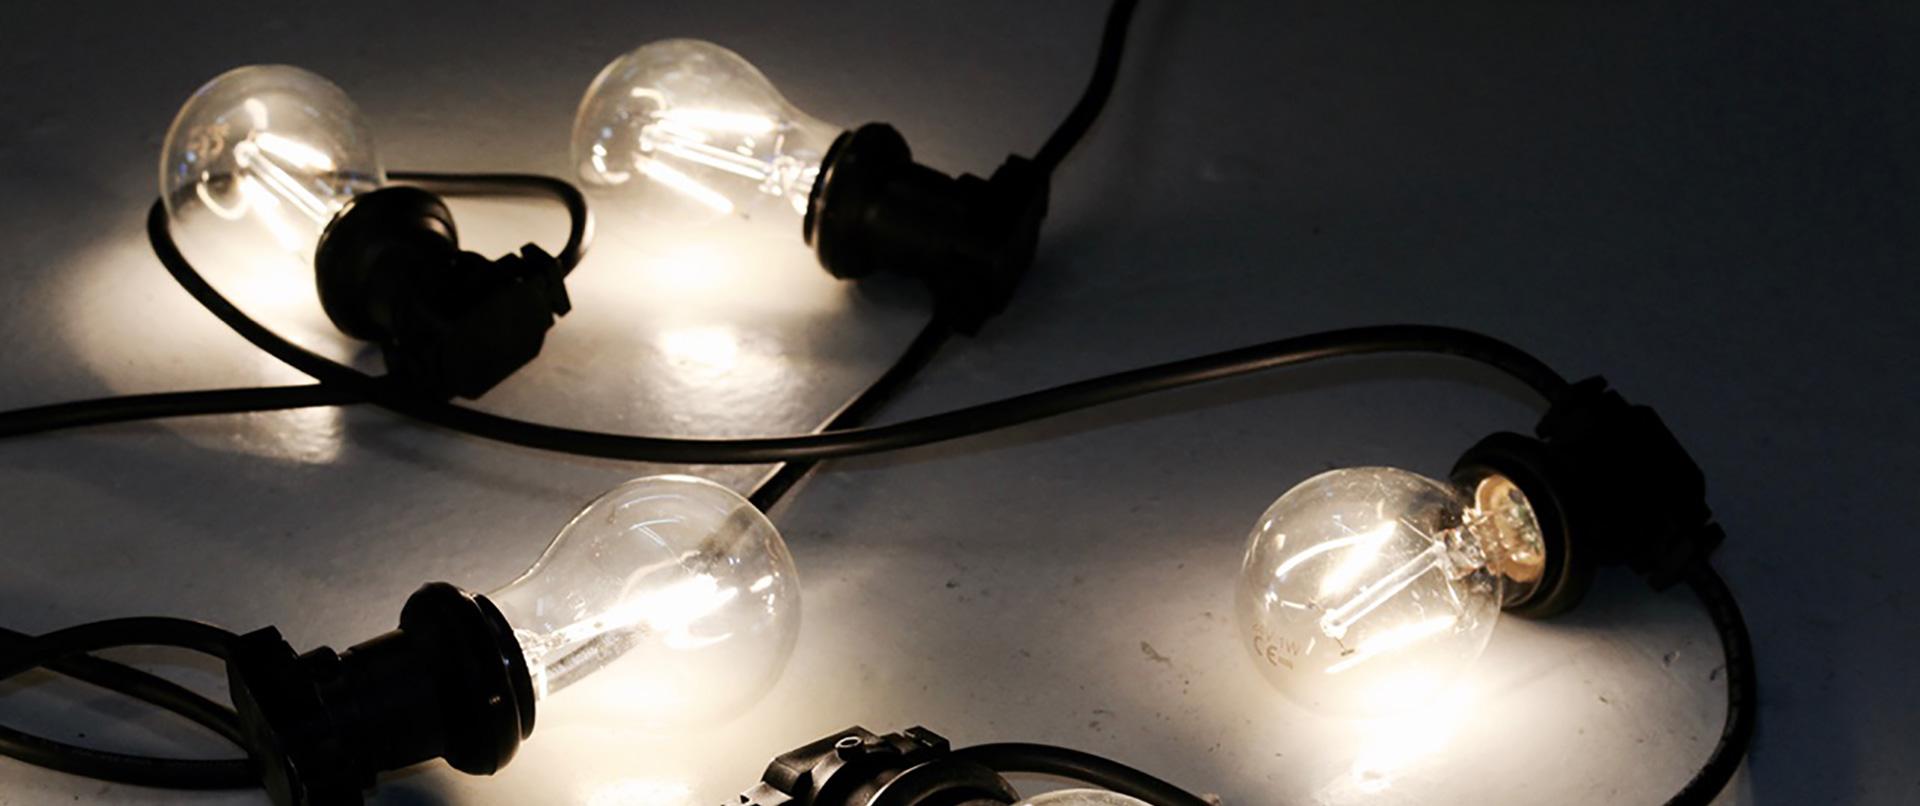 Phase 1 Electrical Festoon Lighting